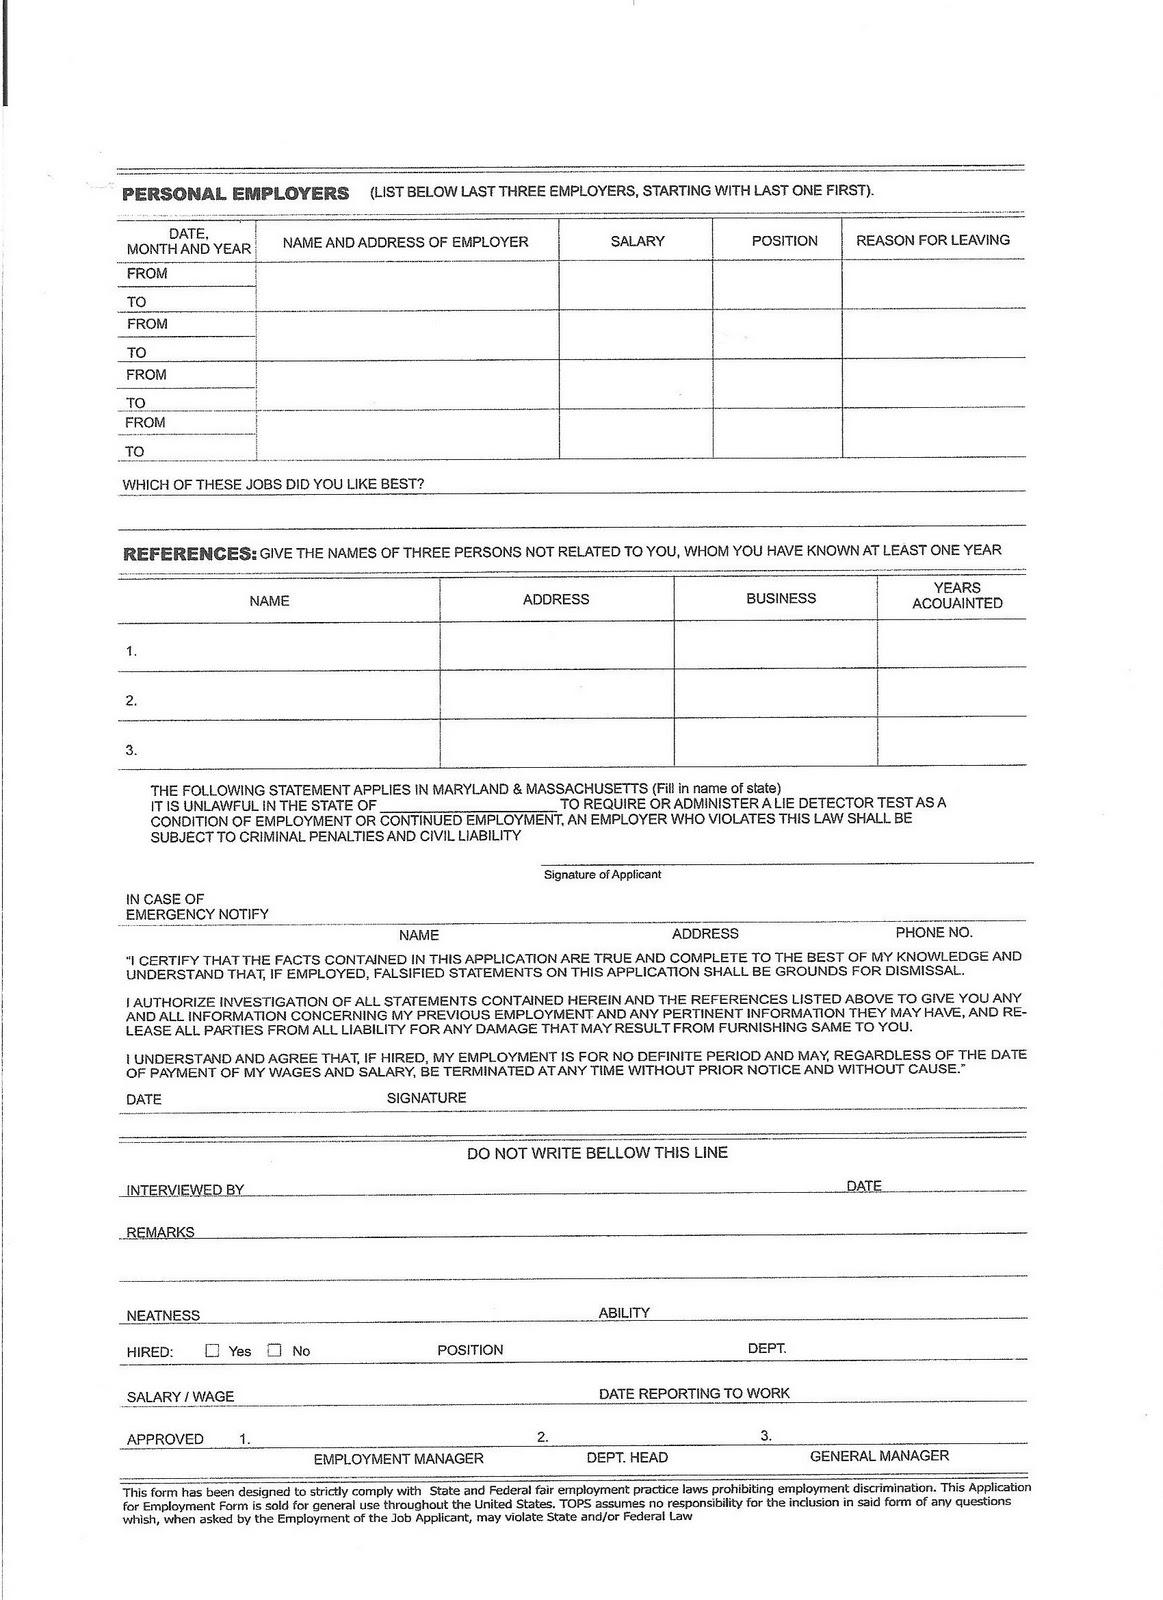 standard job application form template .